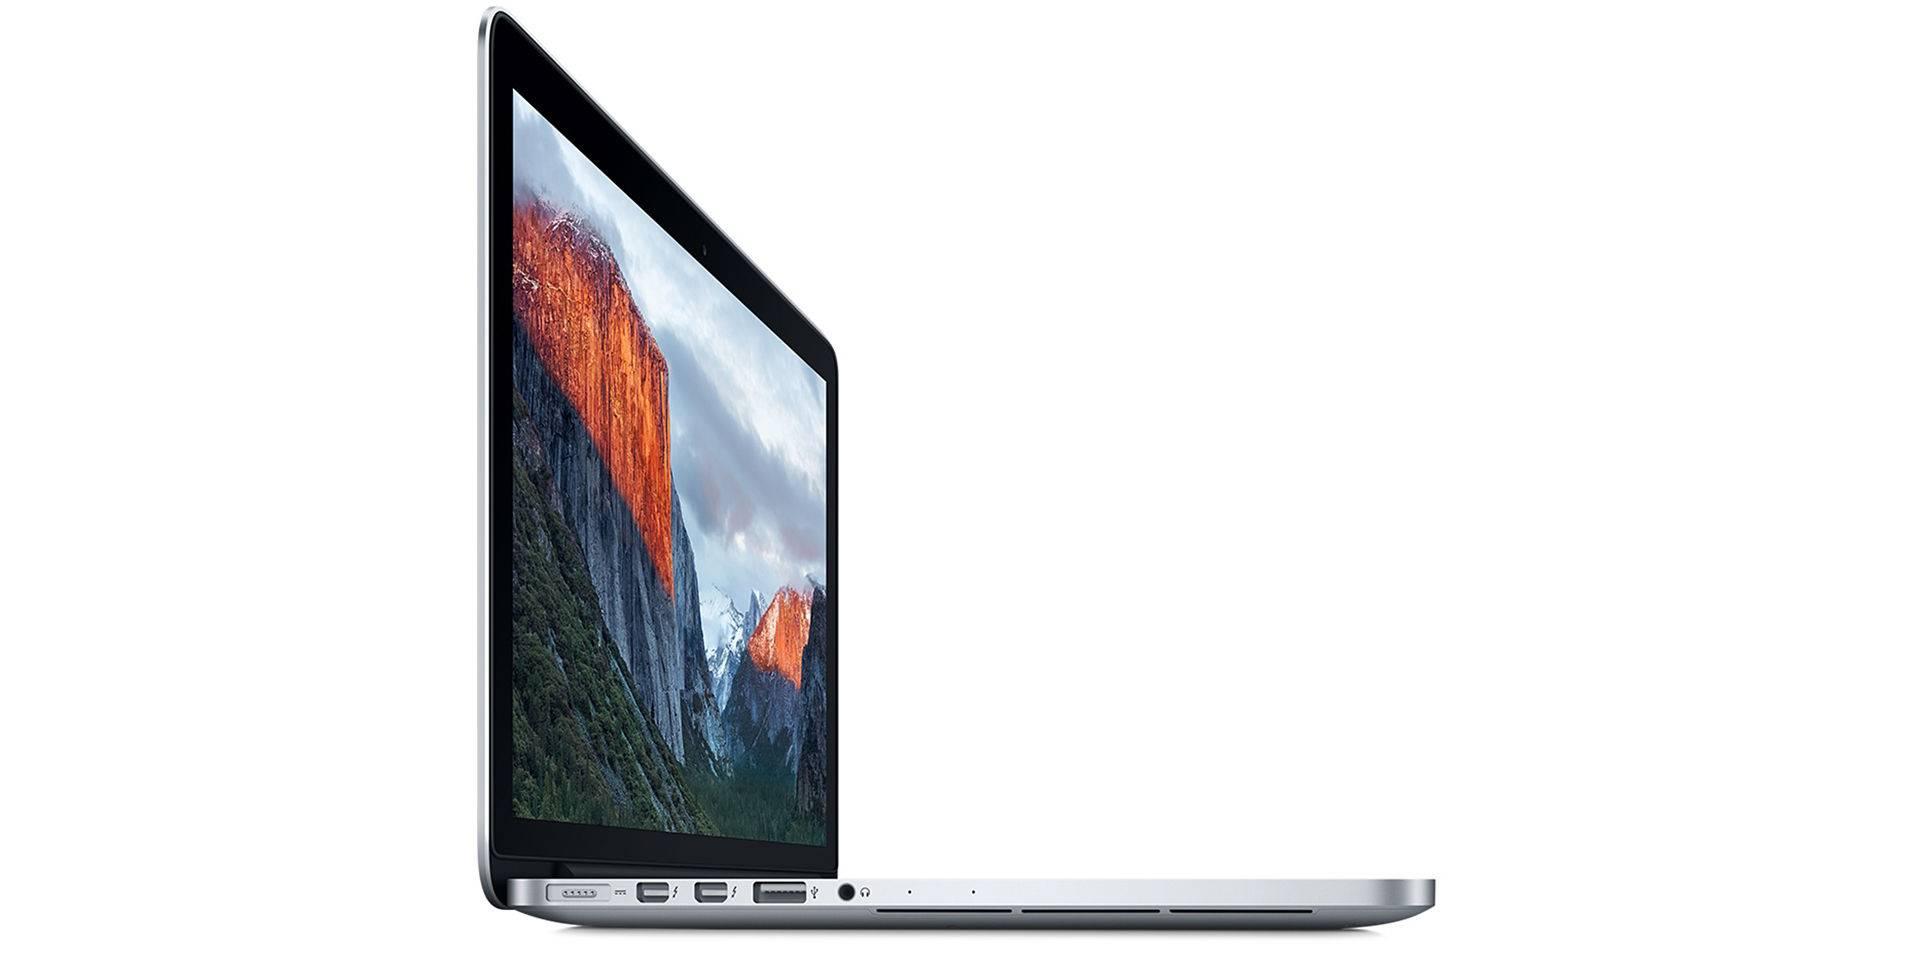 macbook-pro-retina-mf840lla.jpg